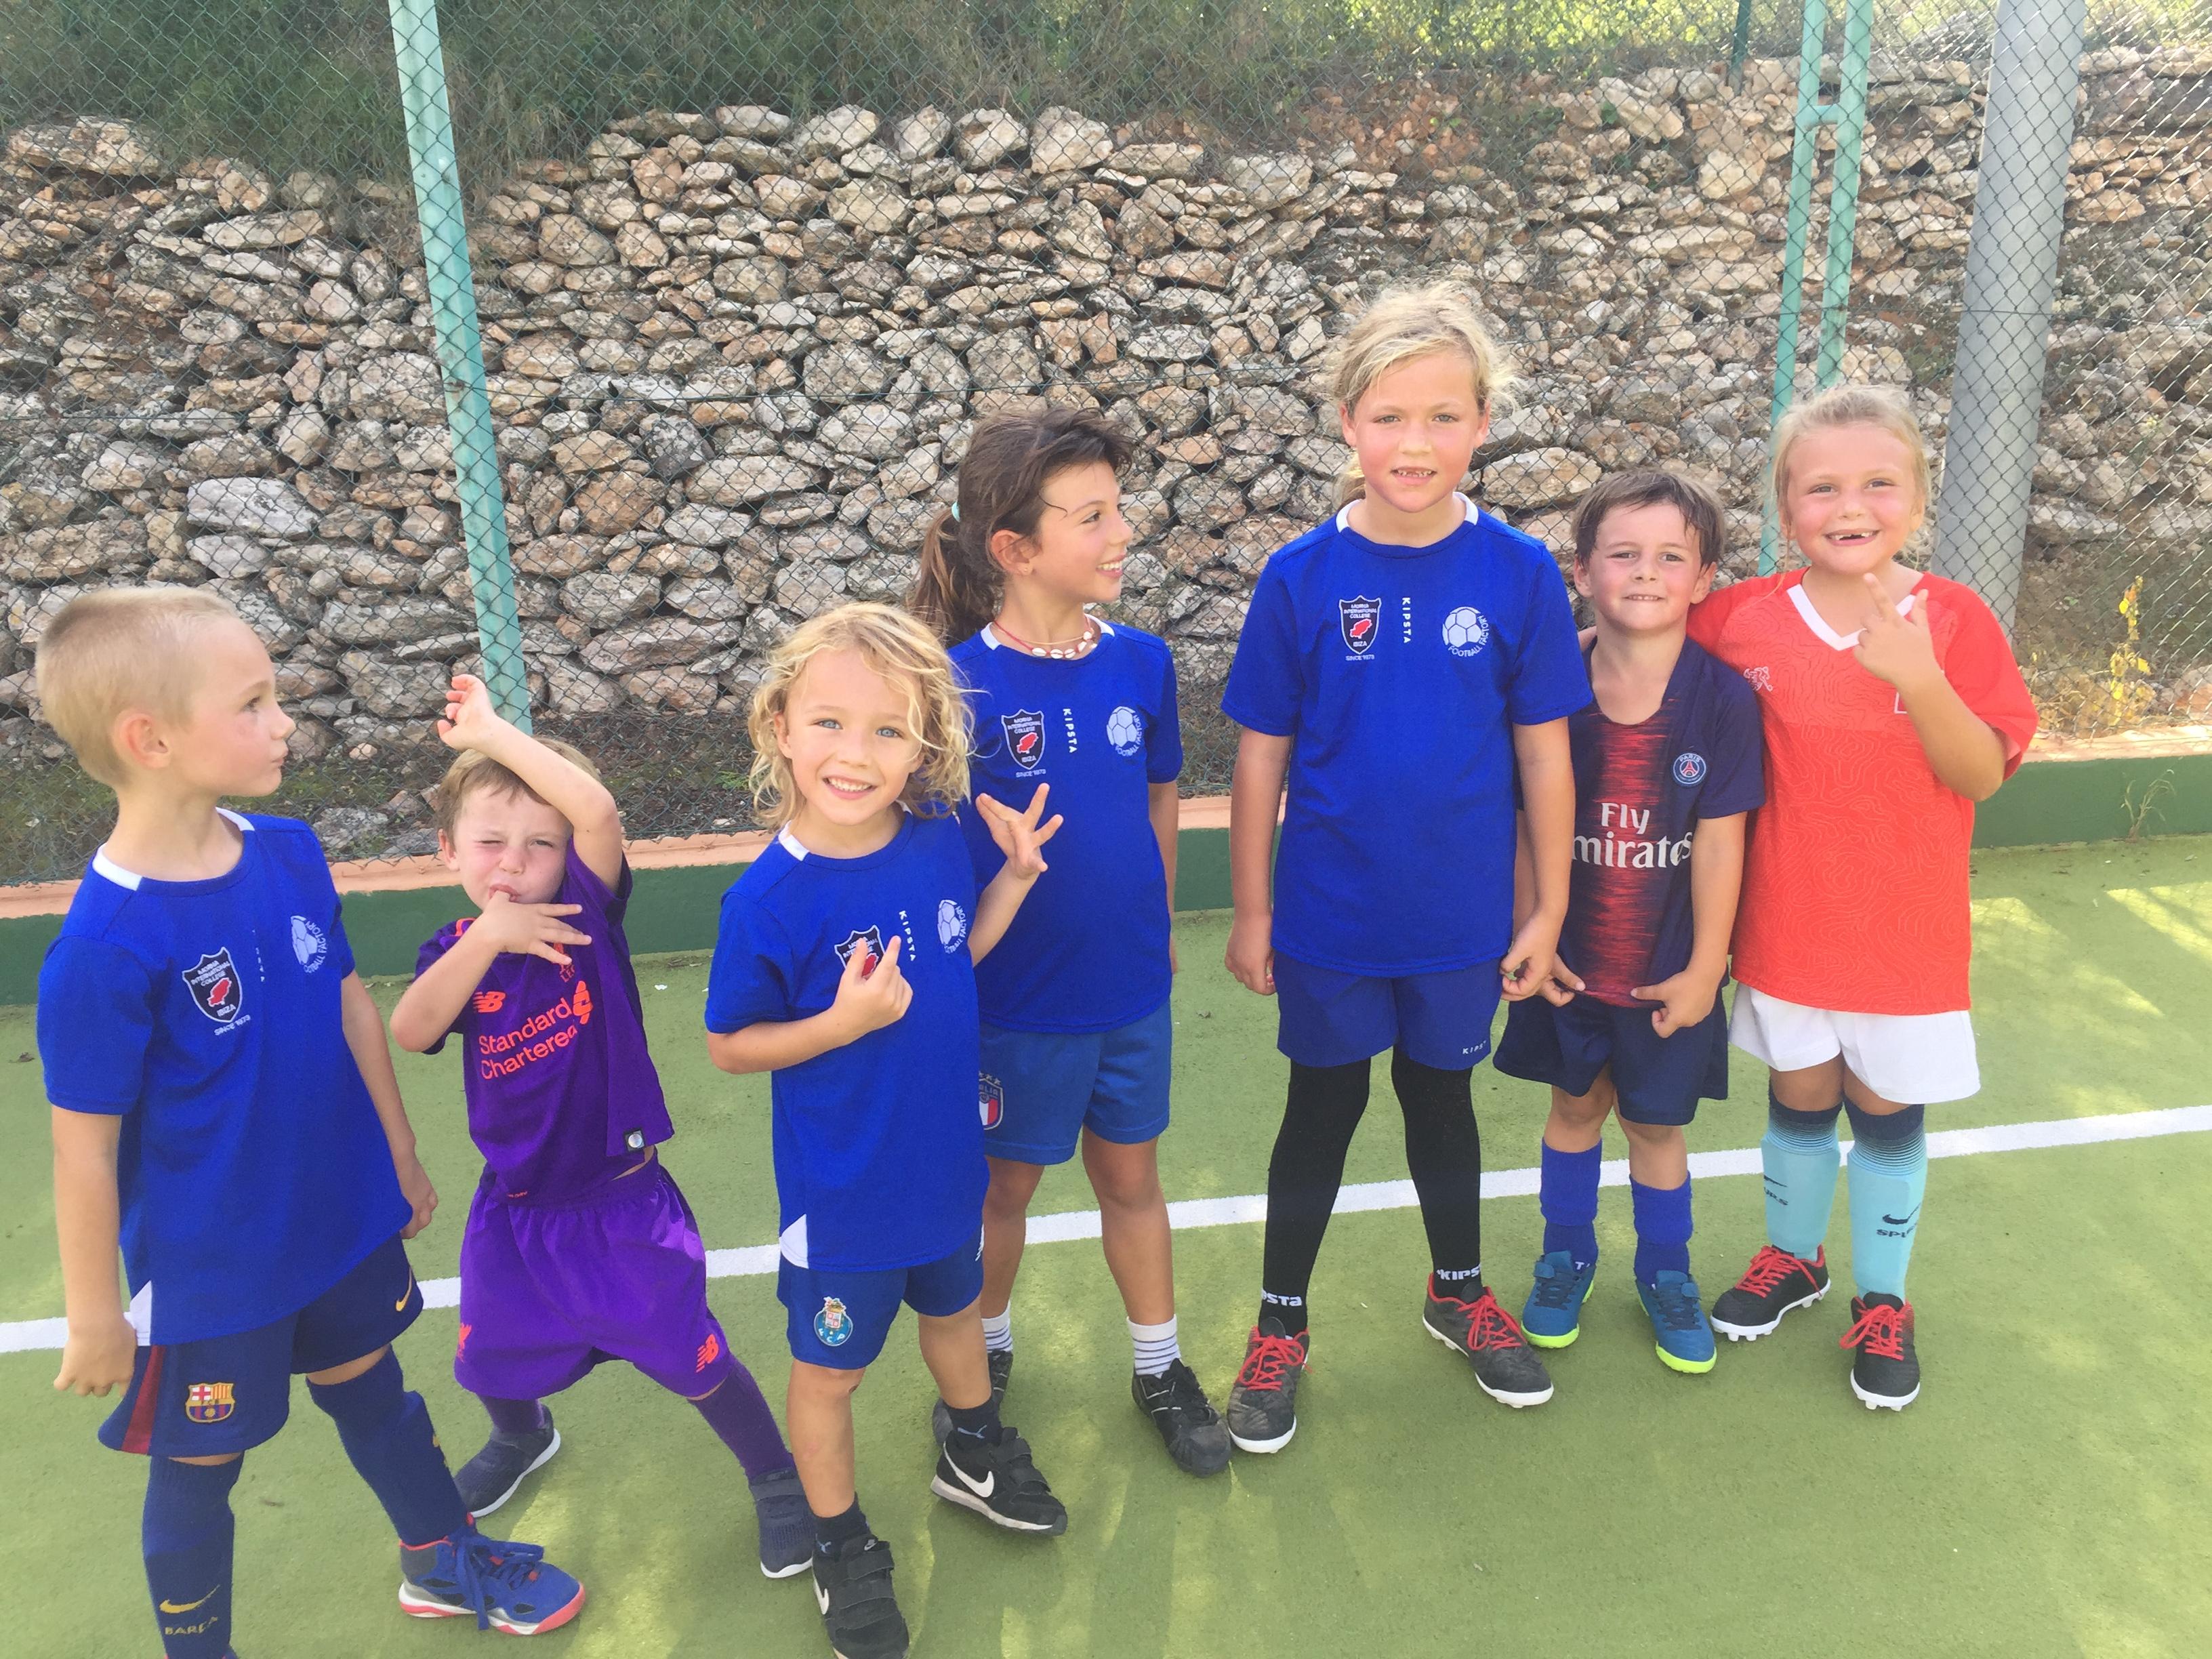 soccerkids01